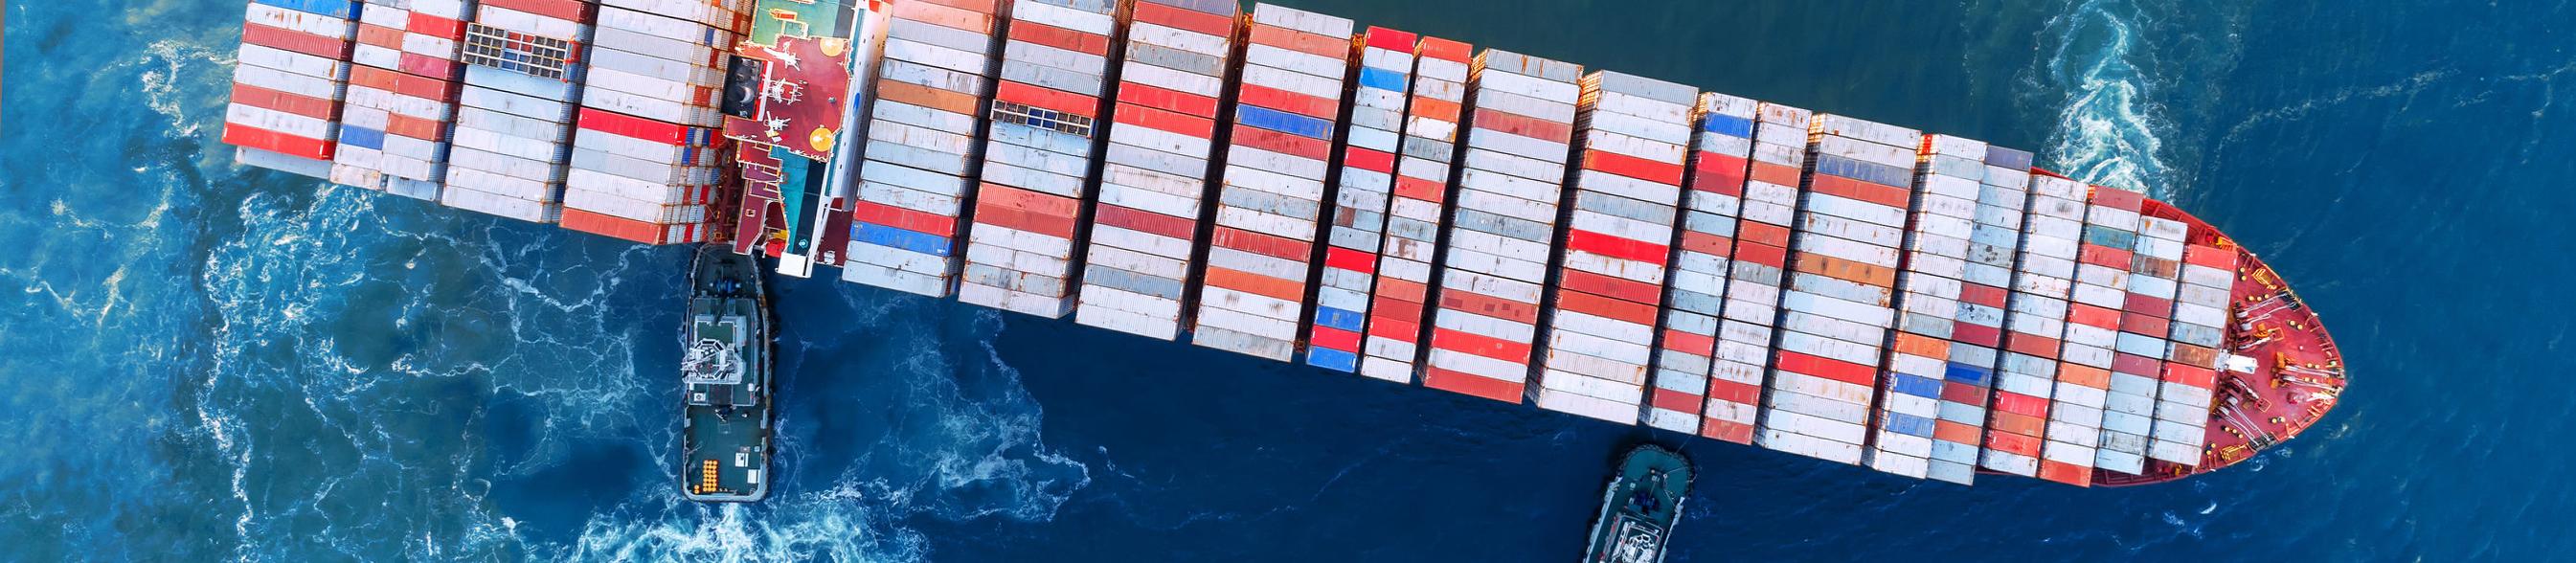 cargo-ship-aerial-wartsila-shaft-line-repair-services